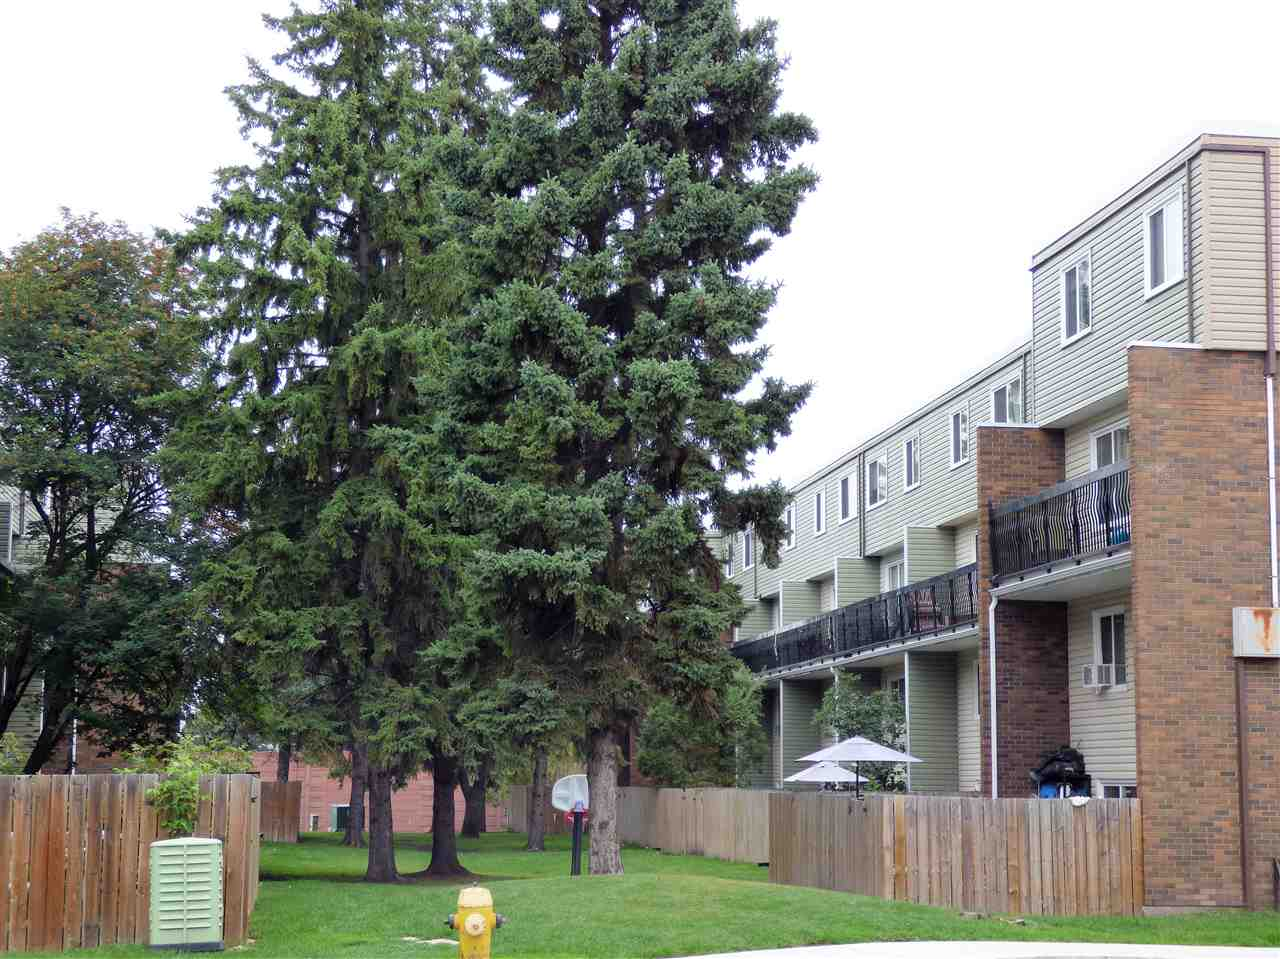 For Sale: 208 - 7835 159 Street, Edmonton, AB | 2 Bed, 2 Bath Condo for $147,000. See 13 photos!